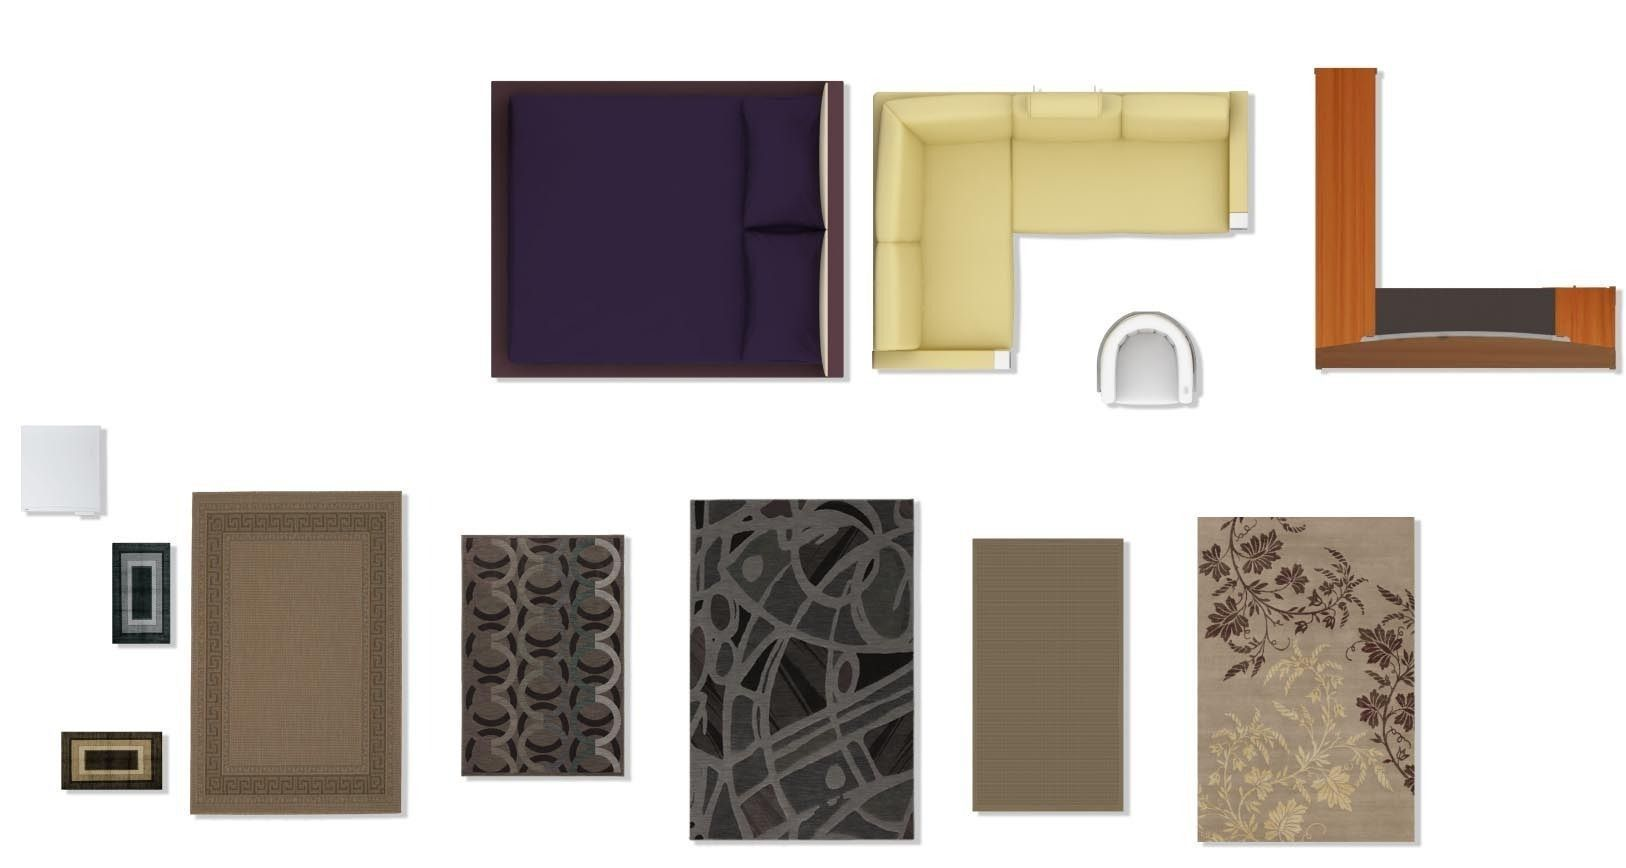 Psd 2d floorplan furniture 3d model 2d furniture and for Muebles de oficina 3d model